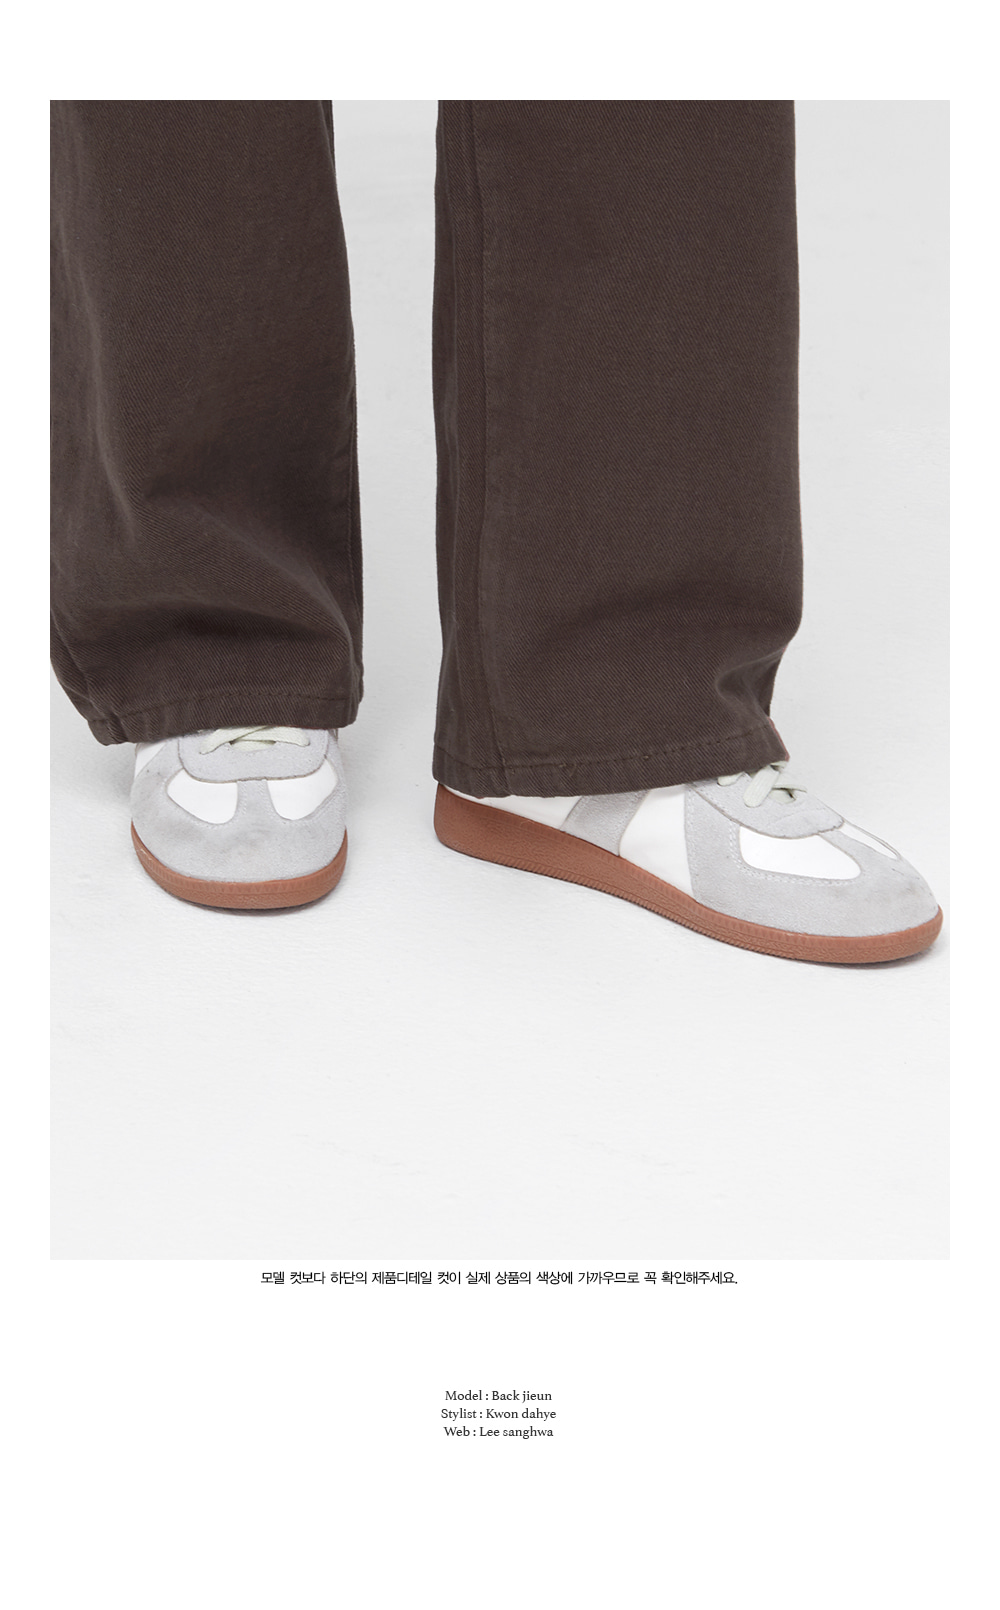 martin simple sneakers (225-250)